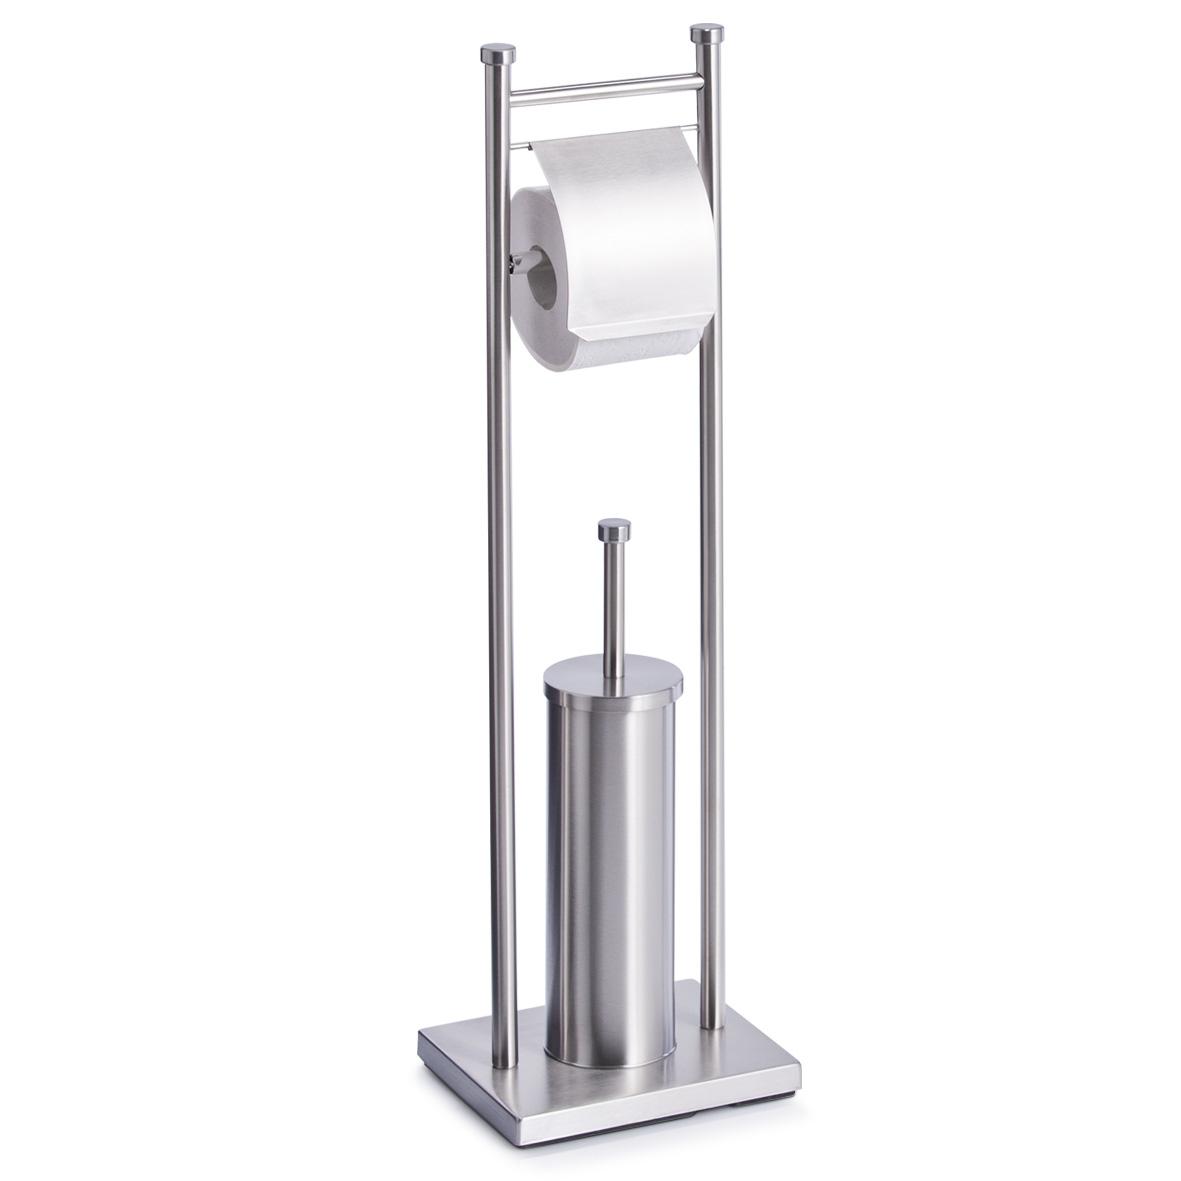 Suport pentru hartie igienica si perie de toaleta, Otel inoxidabil, l22xA18xH76 cm din categoria Baie